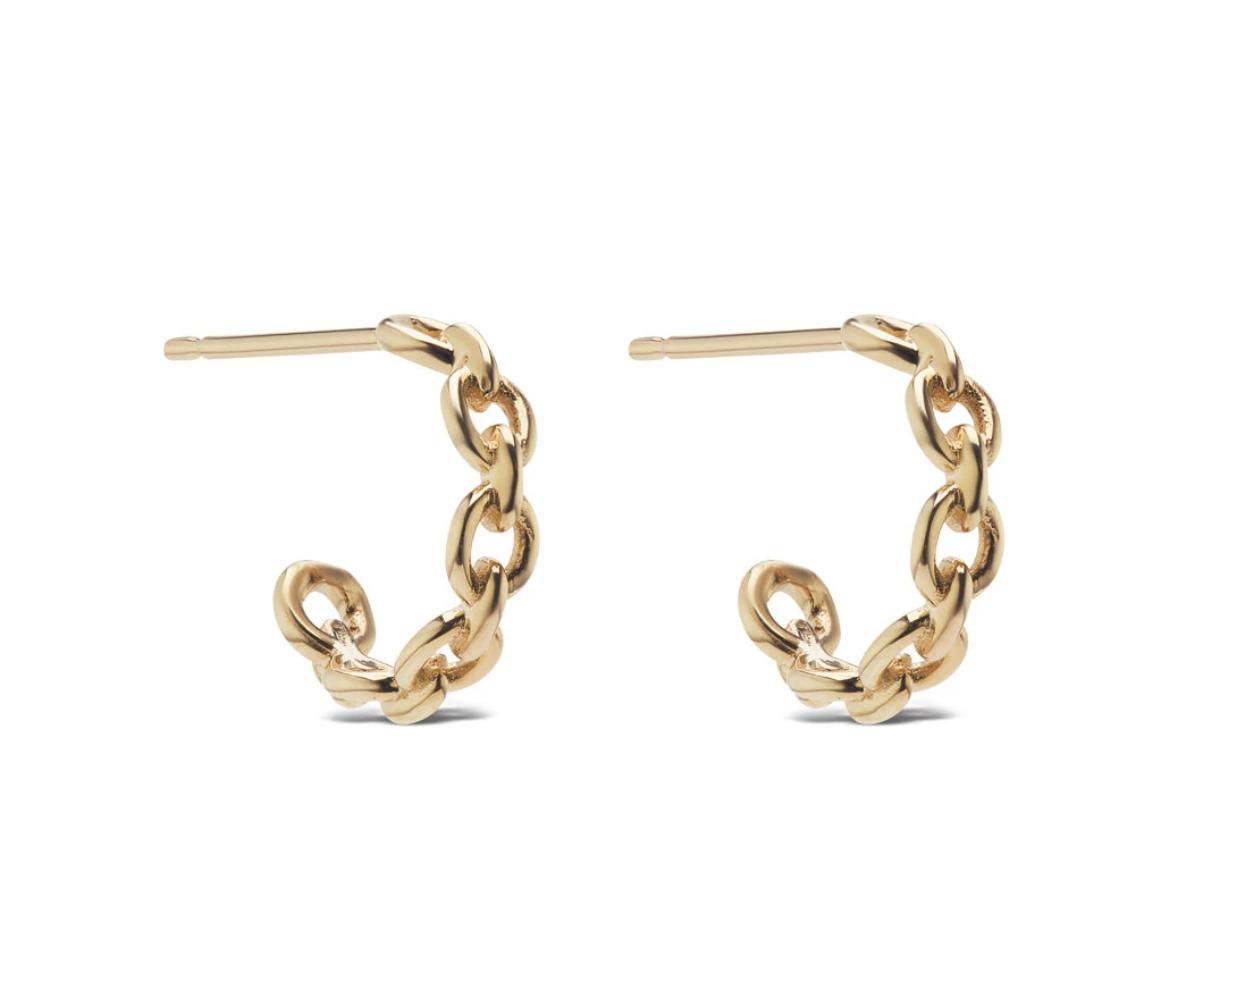 gena-huggies-earrings-14-ct-yellow-gold-handmade-in-nyc